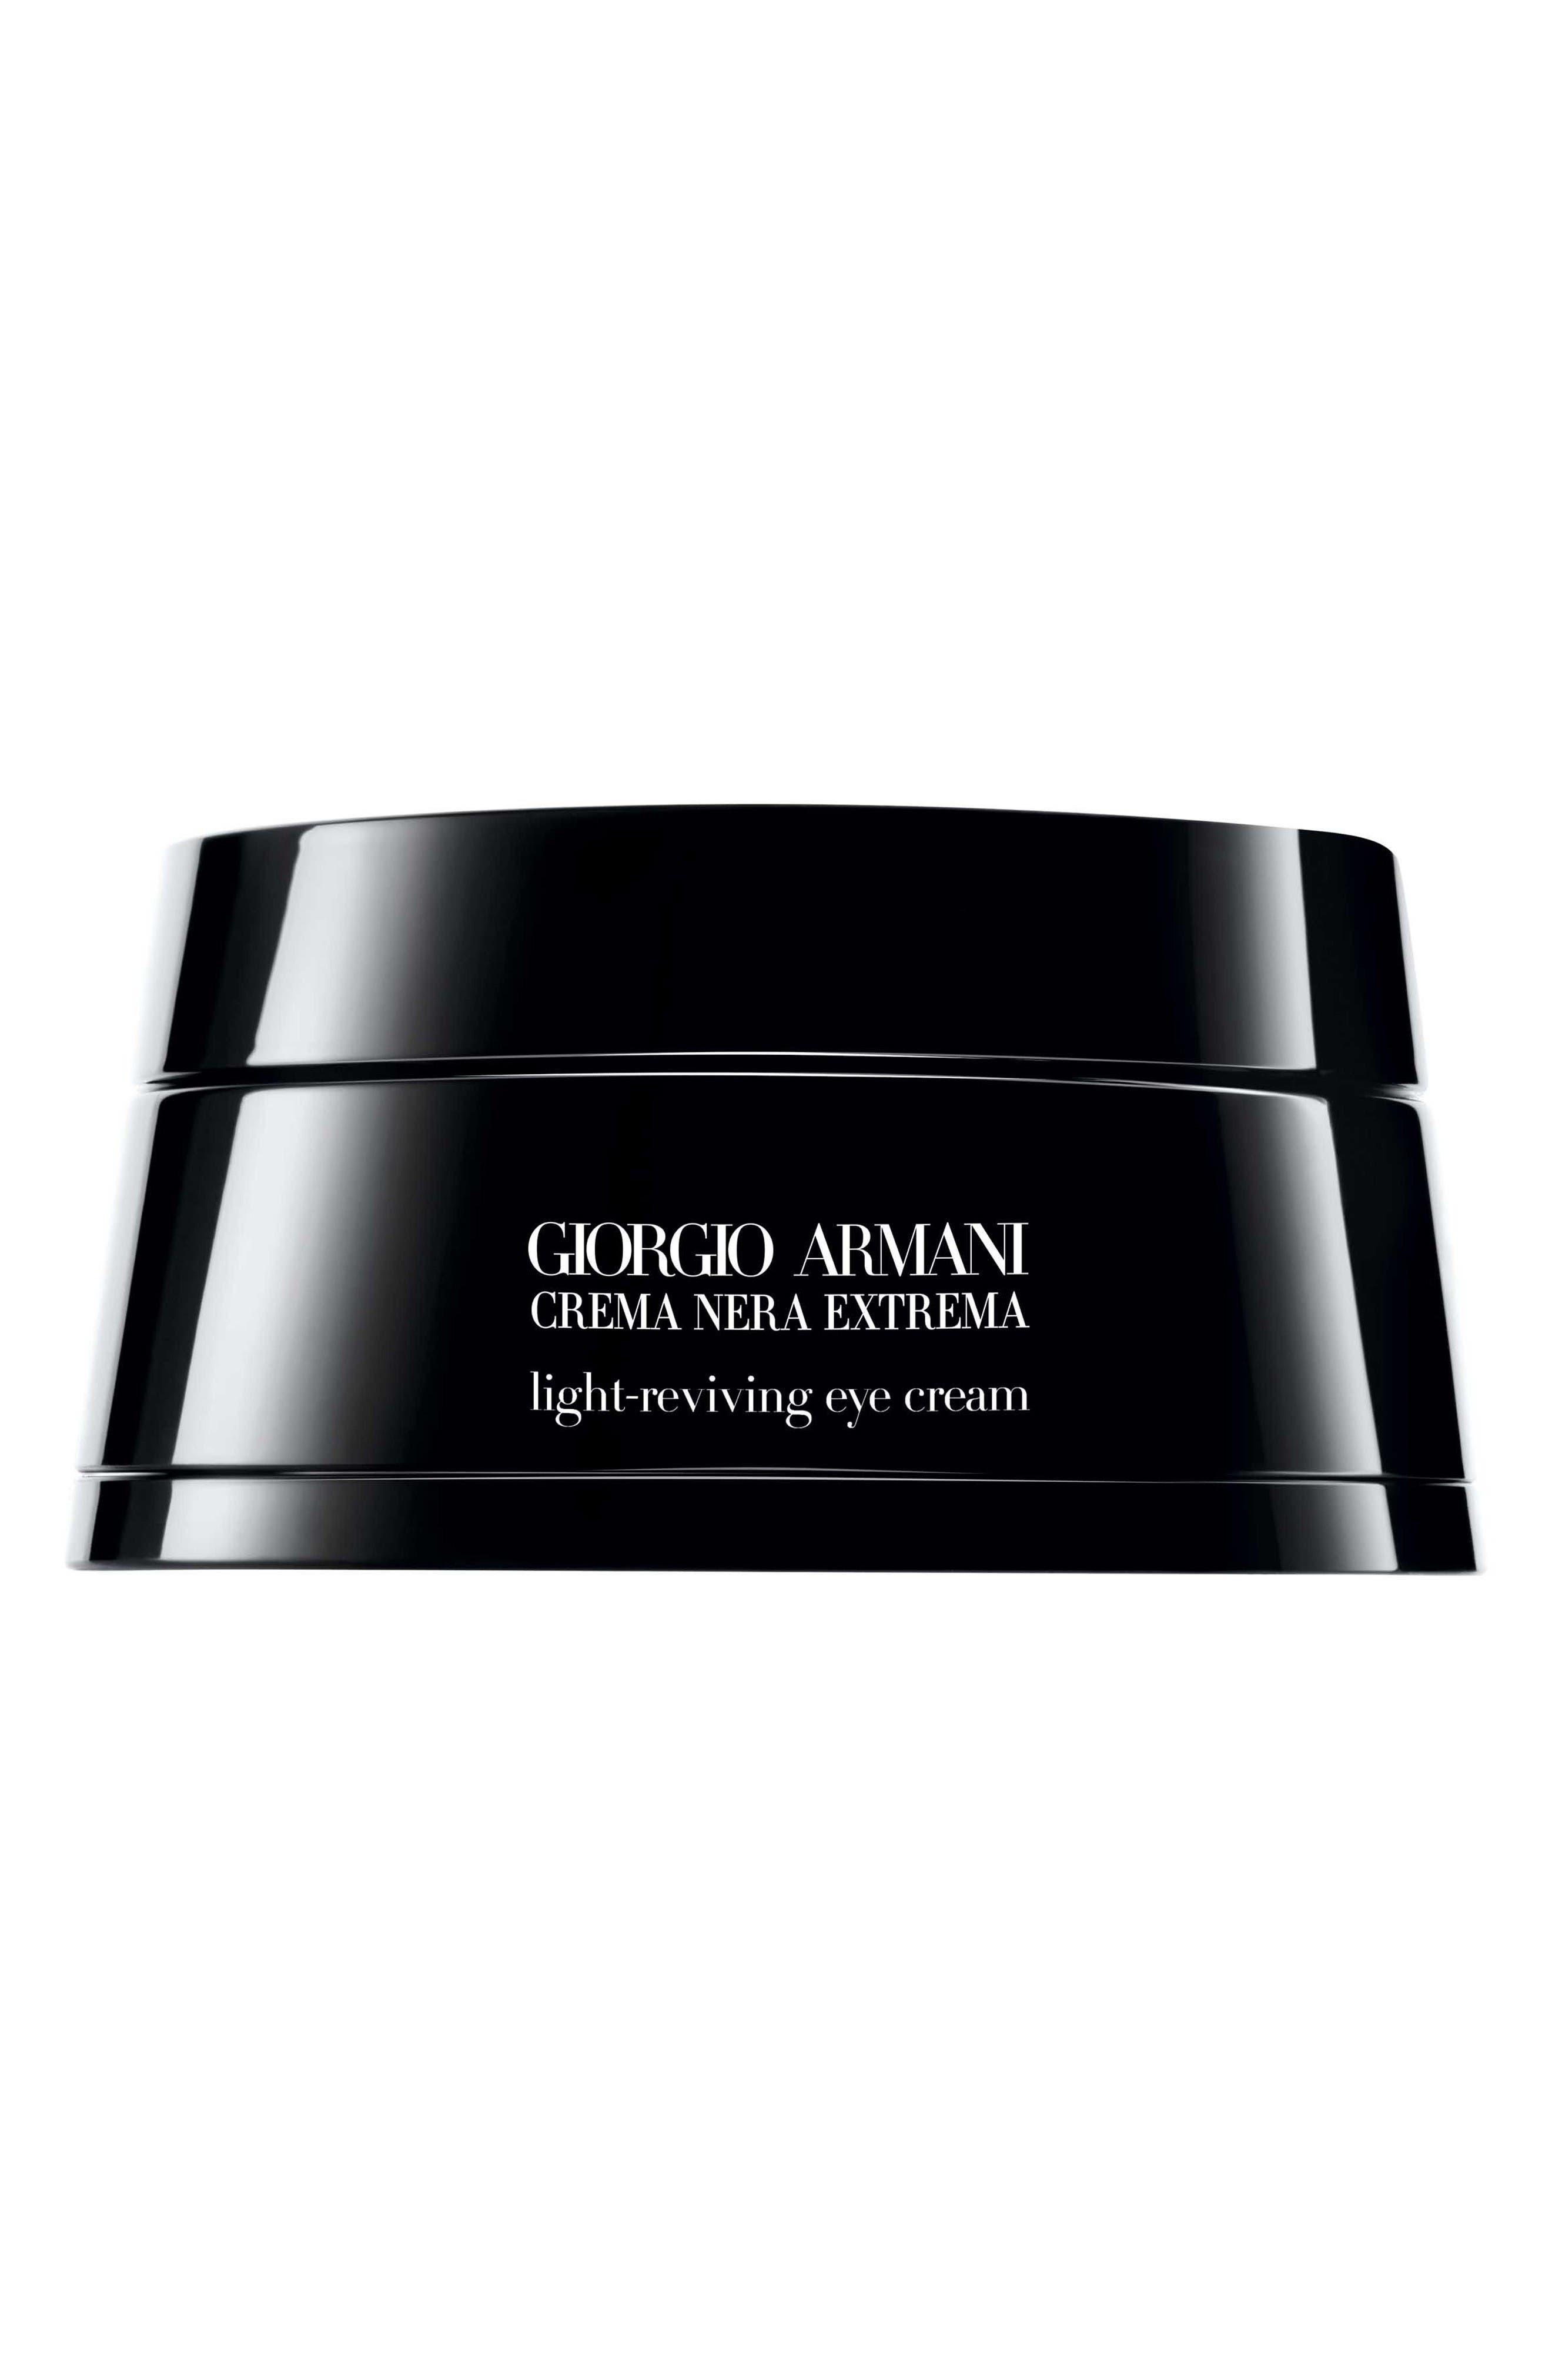 Main Image - Giorgio Armani Crema Nera Extrema Light-Reviving Eye Cream